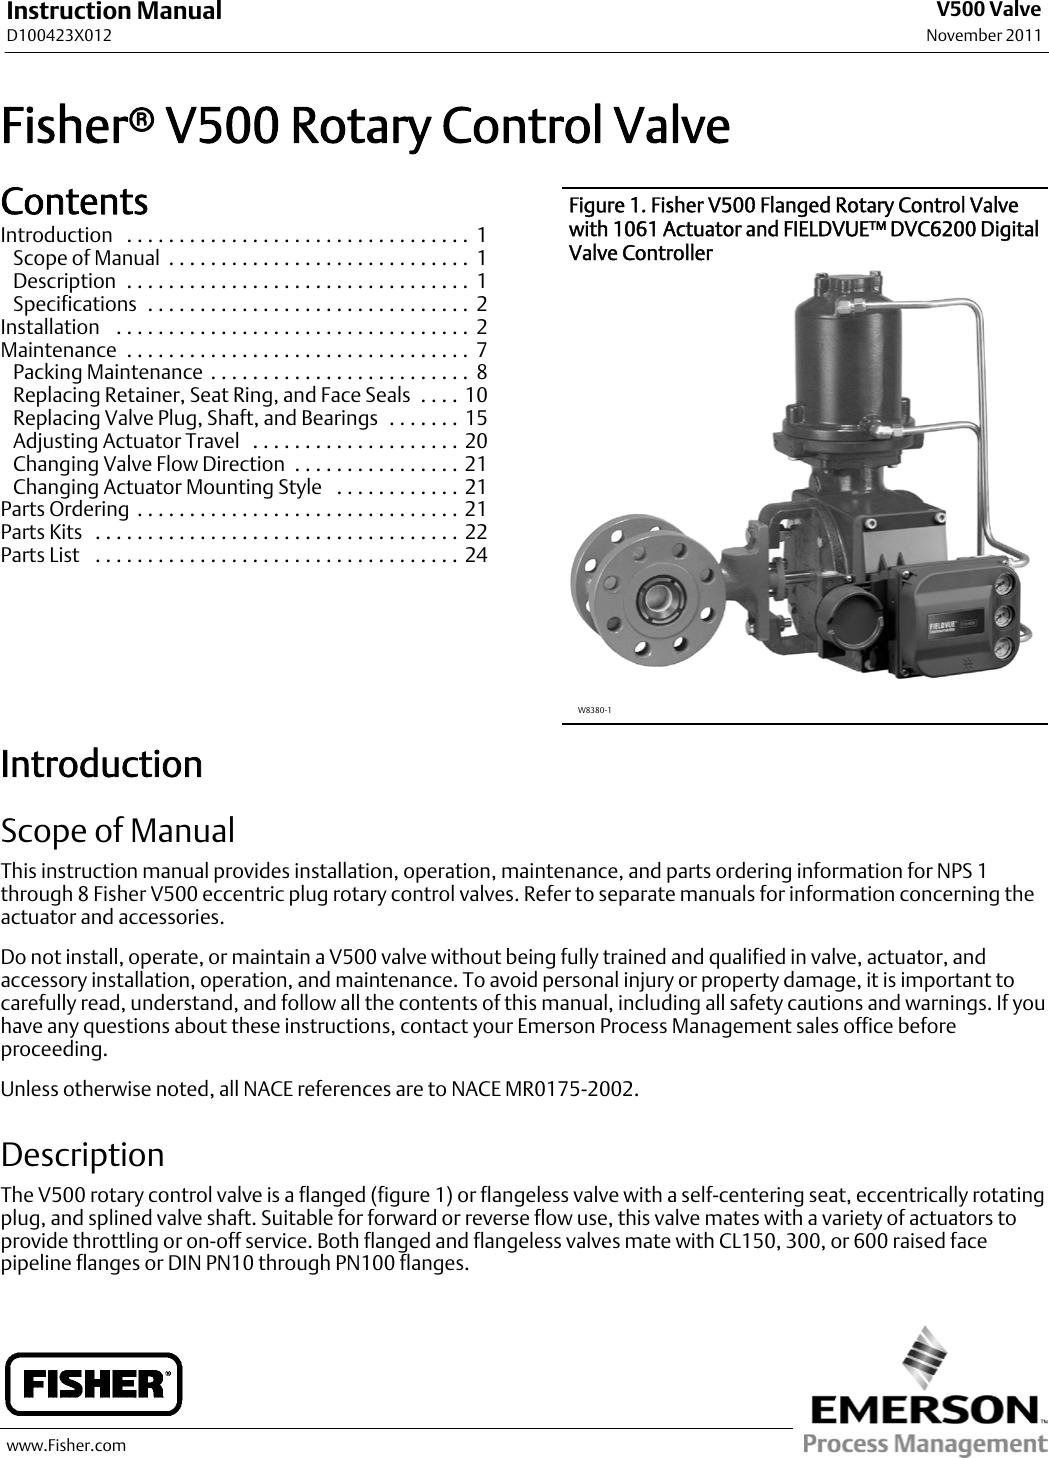 fisher v500 instruction manual